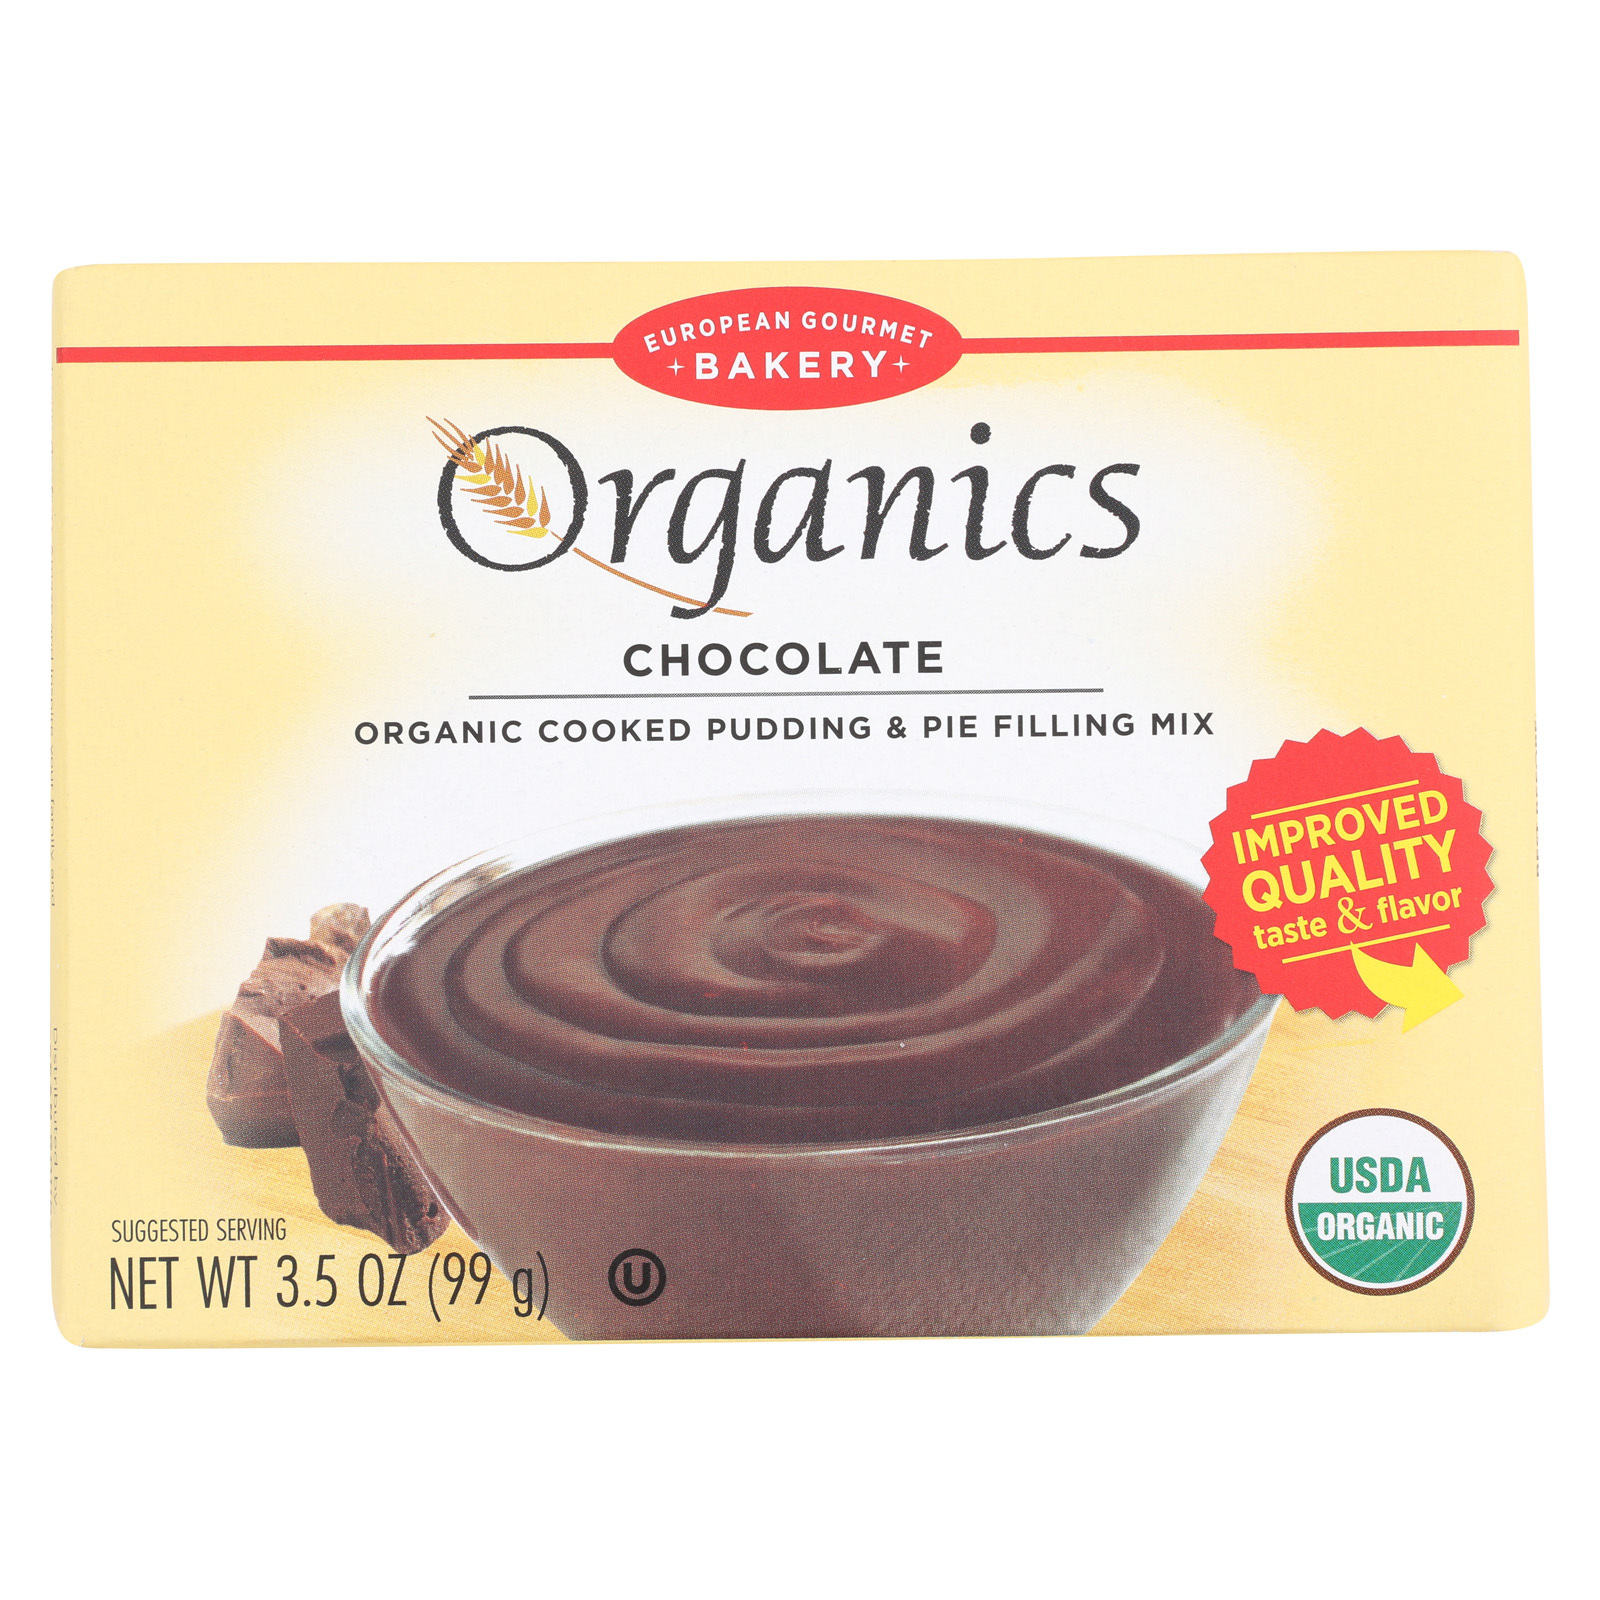 European Gourmet Bakery Organic Chocolate Pudding Mix - Pudding Mix - Case of 12 - 3.5 oz.